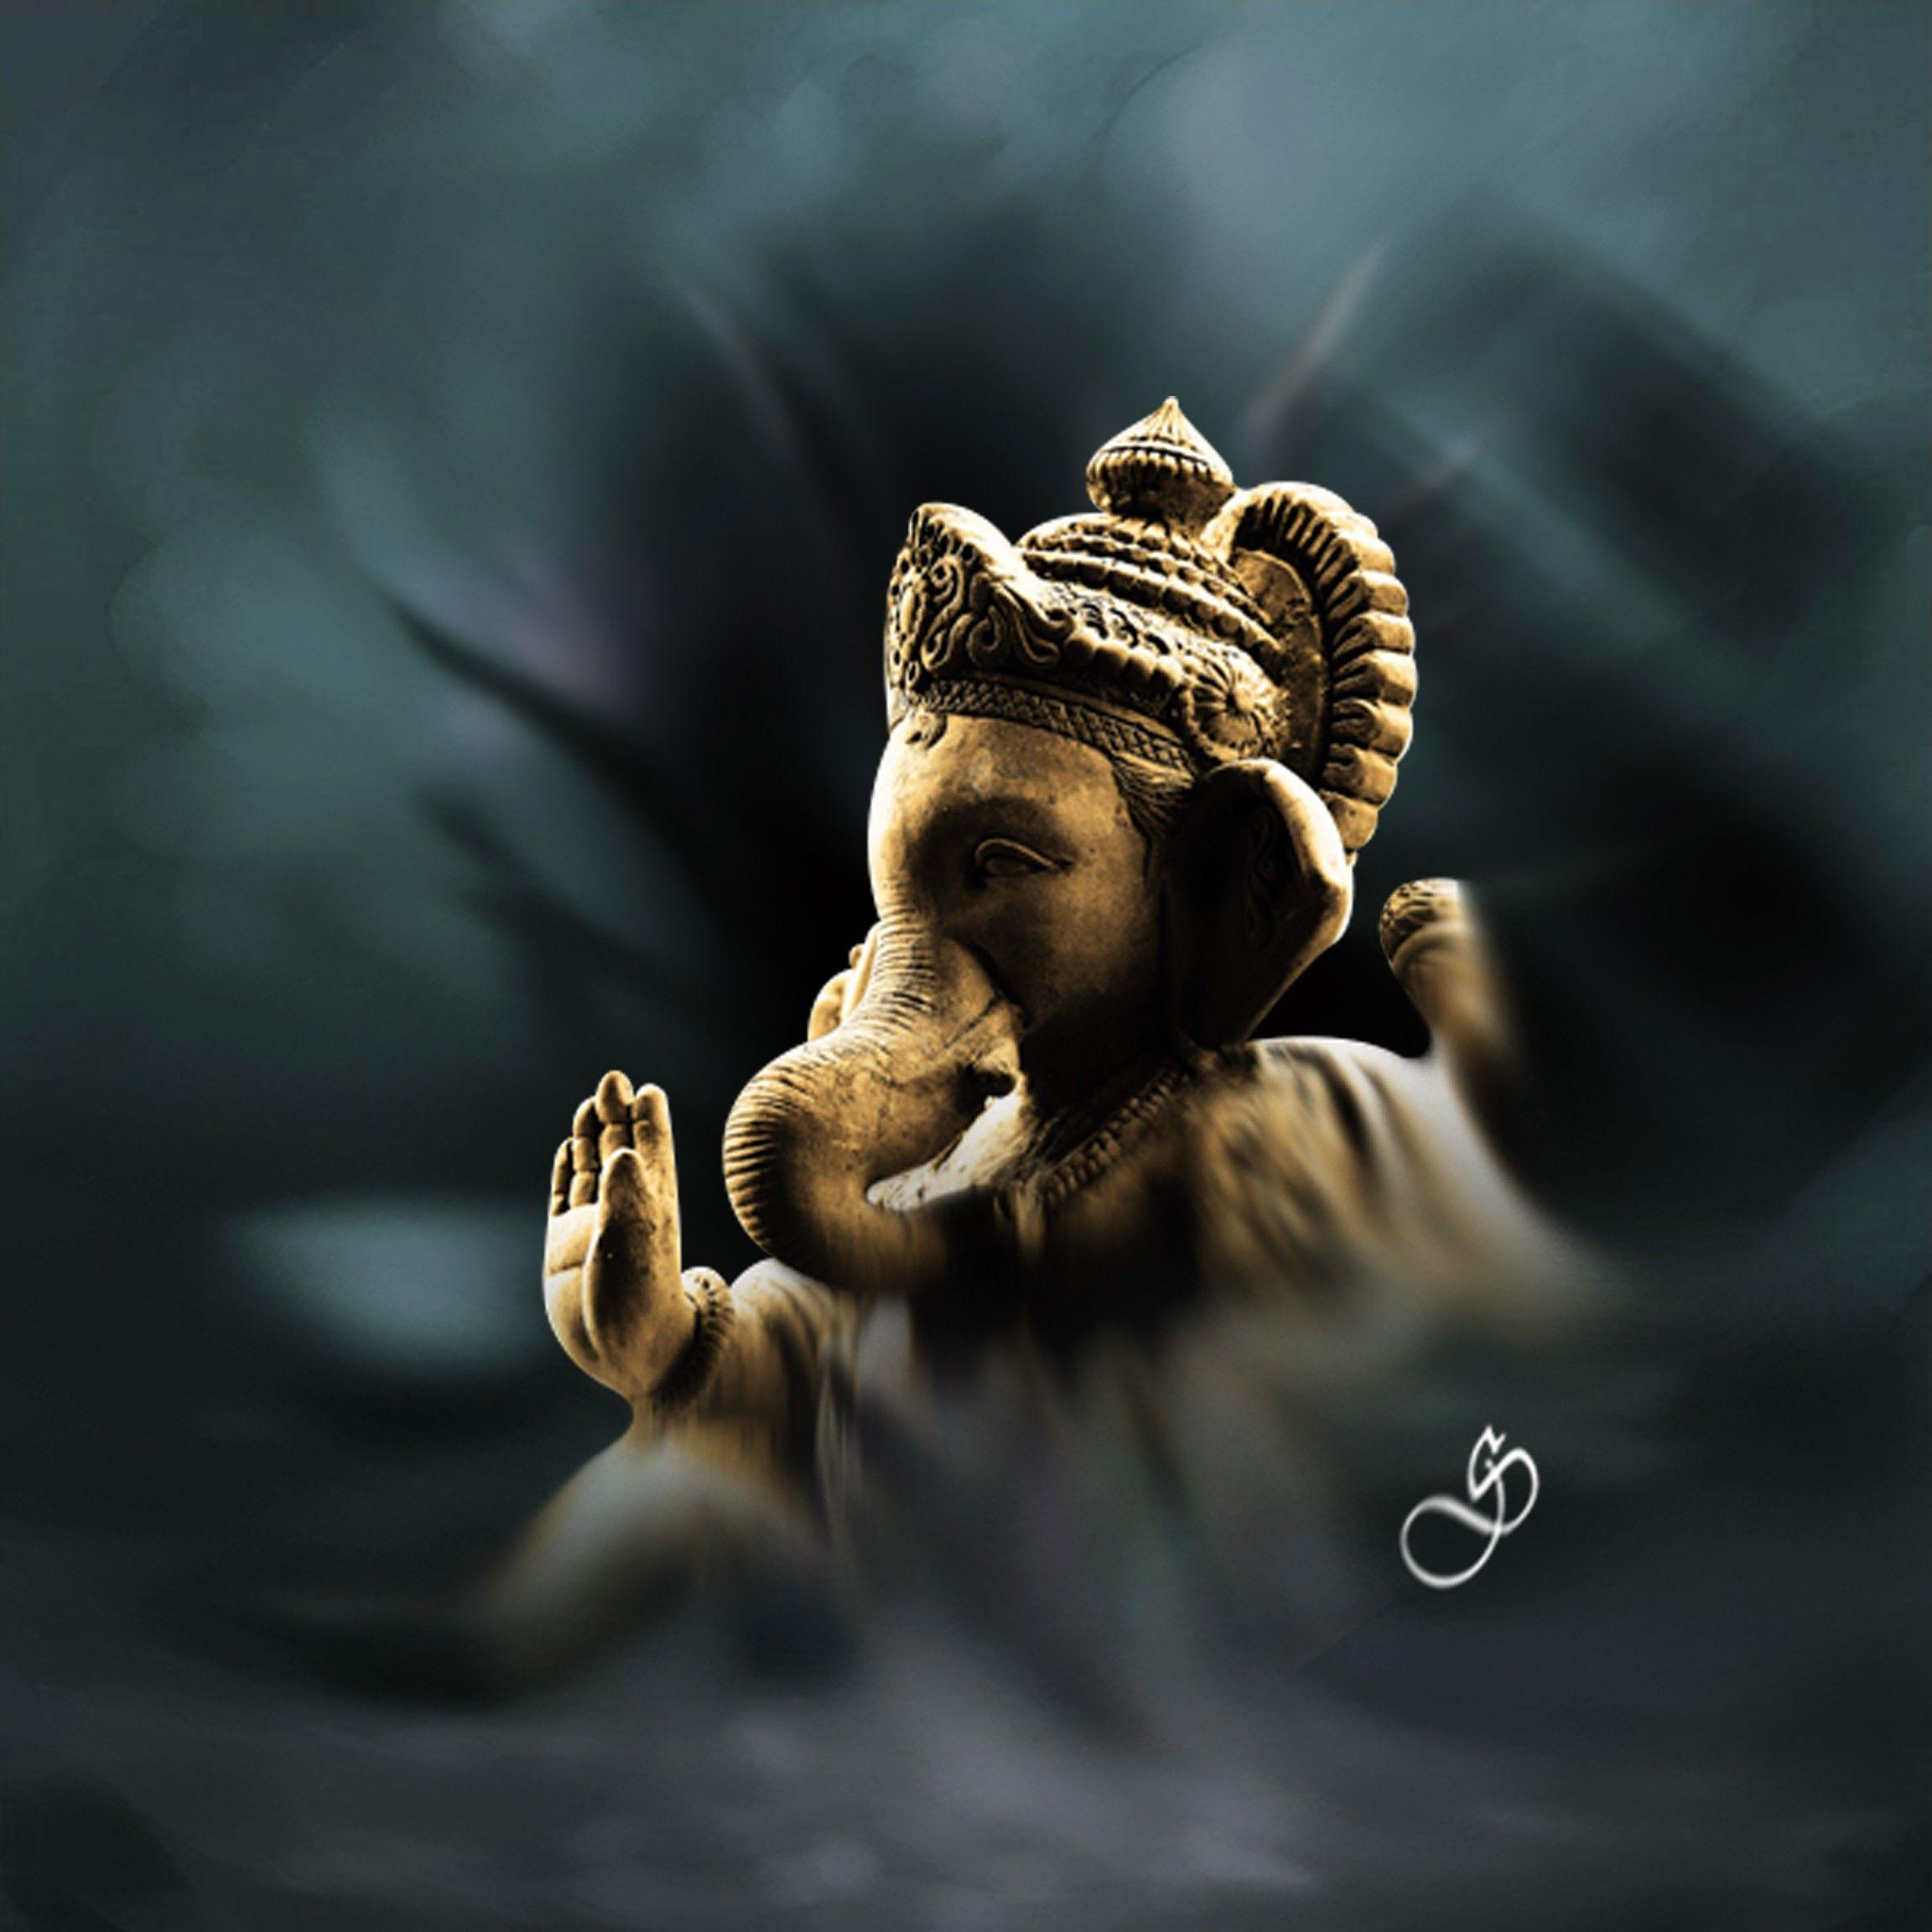 Lord Ganesha Lord ganesha paintings, Ganesha painting